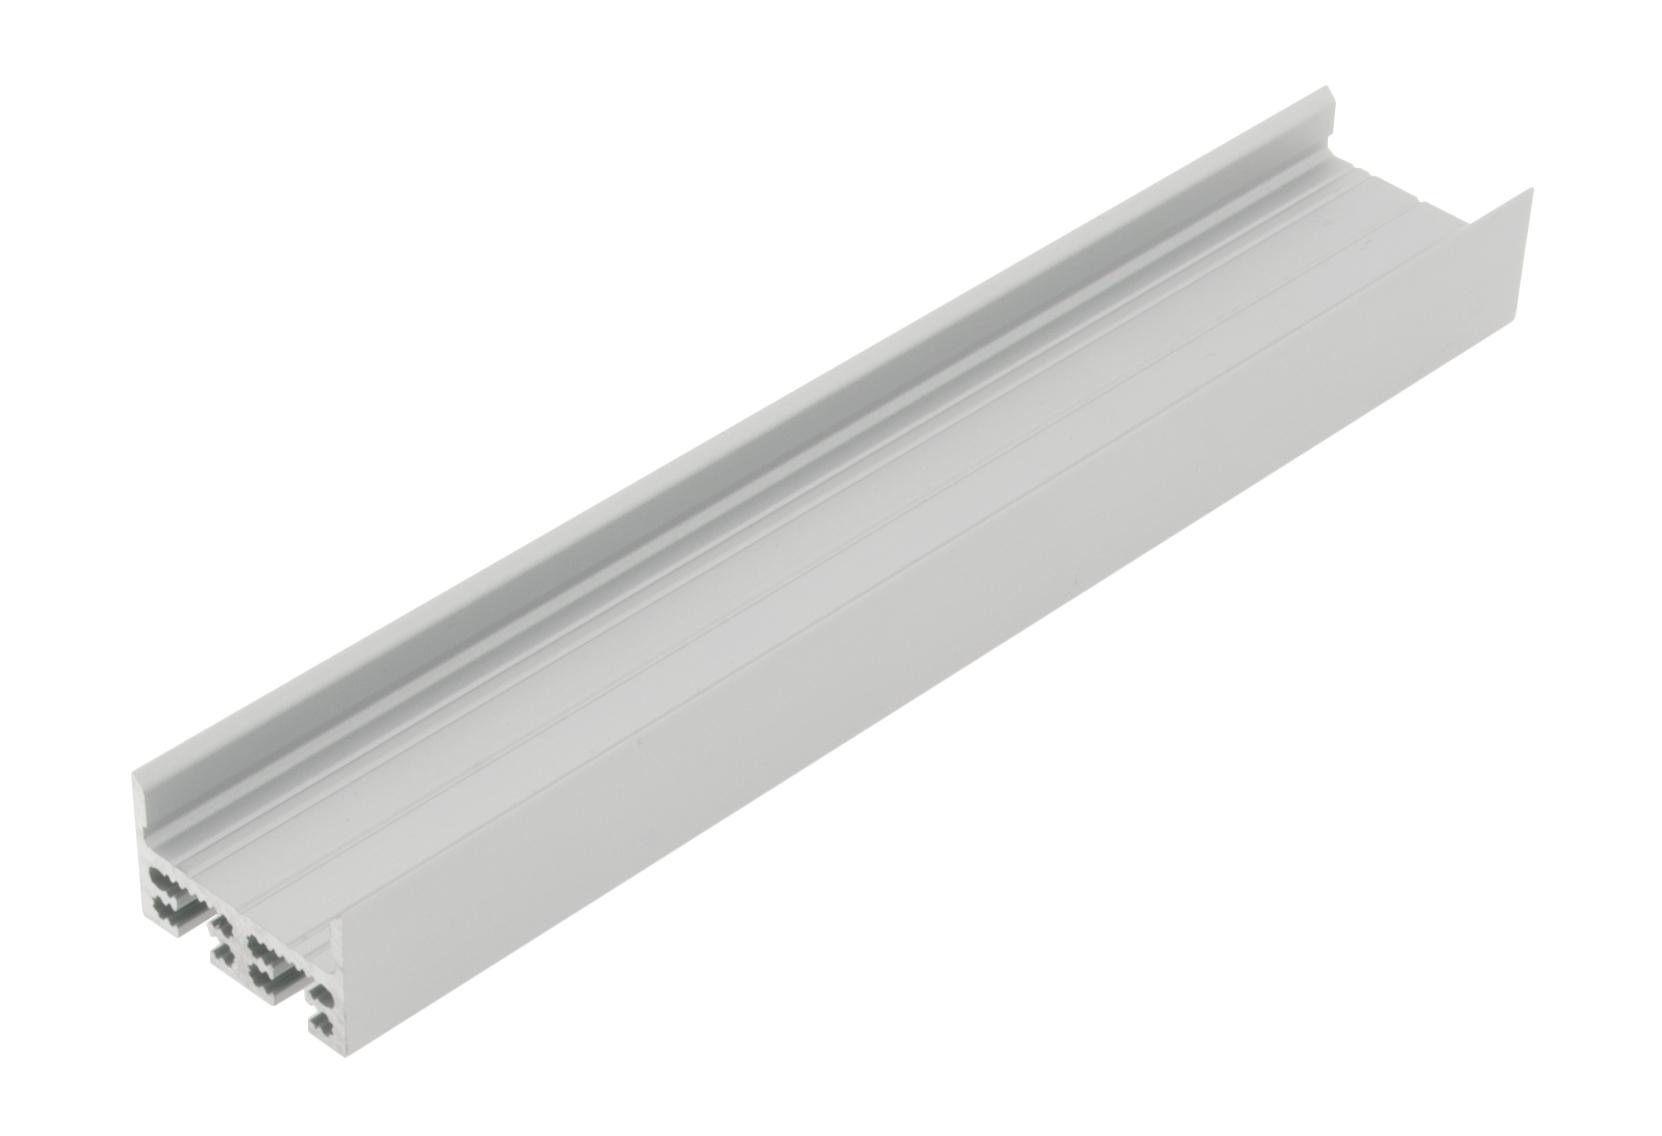 1 m Aluminium Profil TBK, 2m LIAP002010